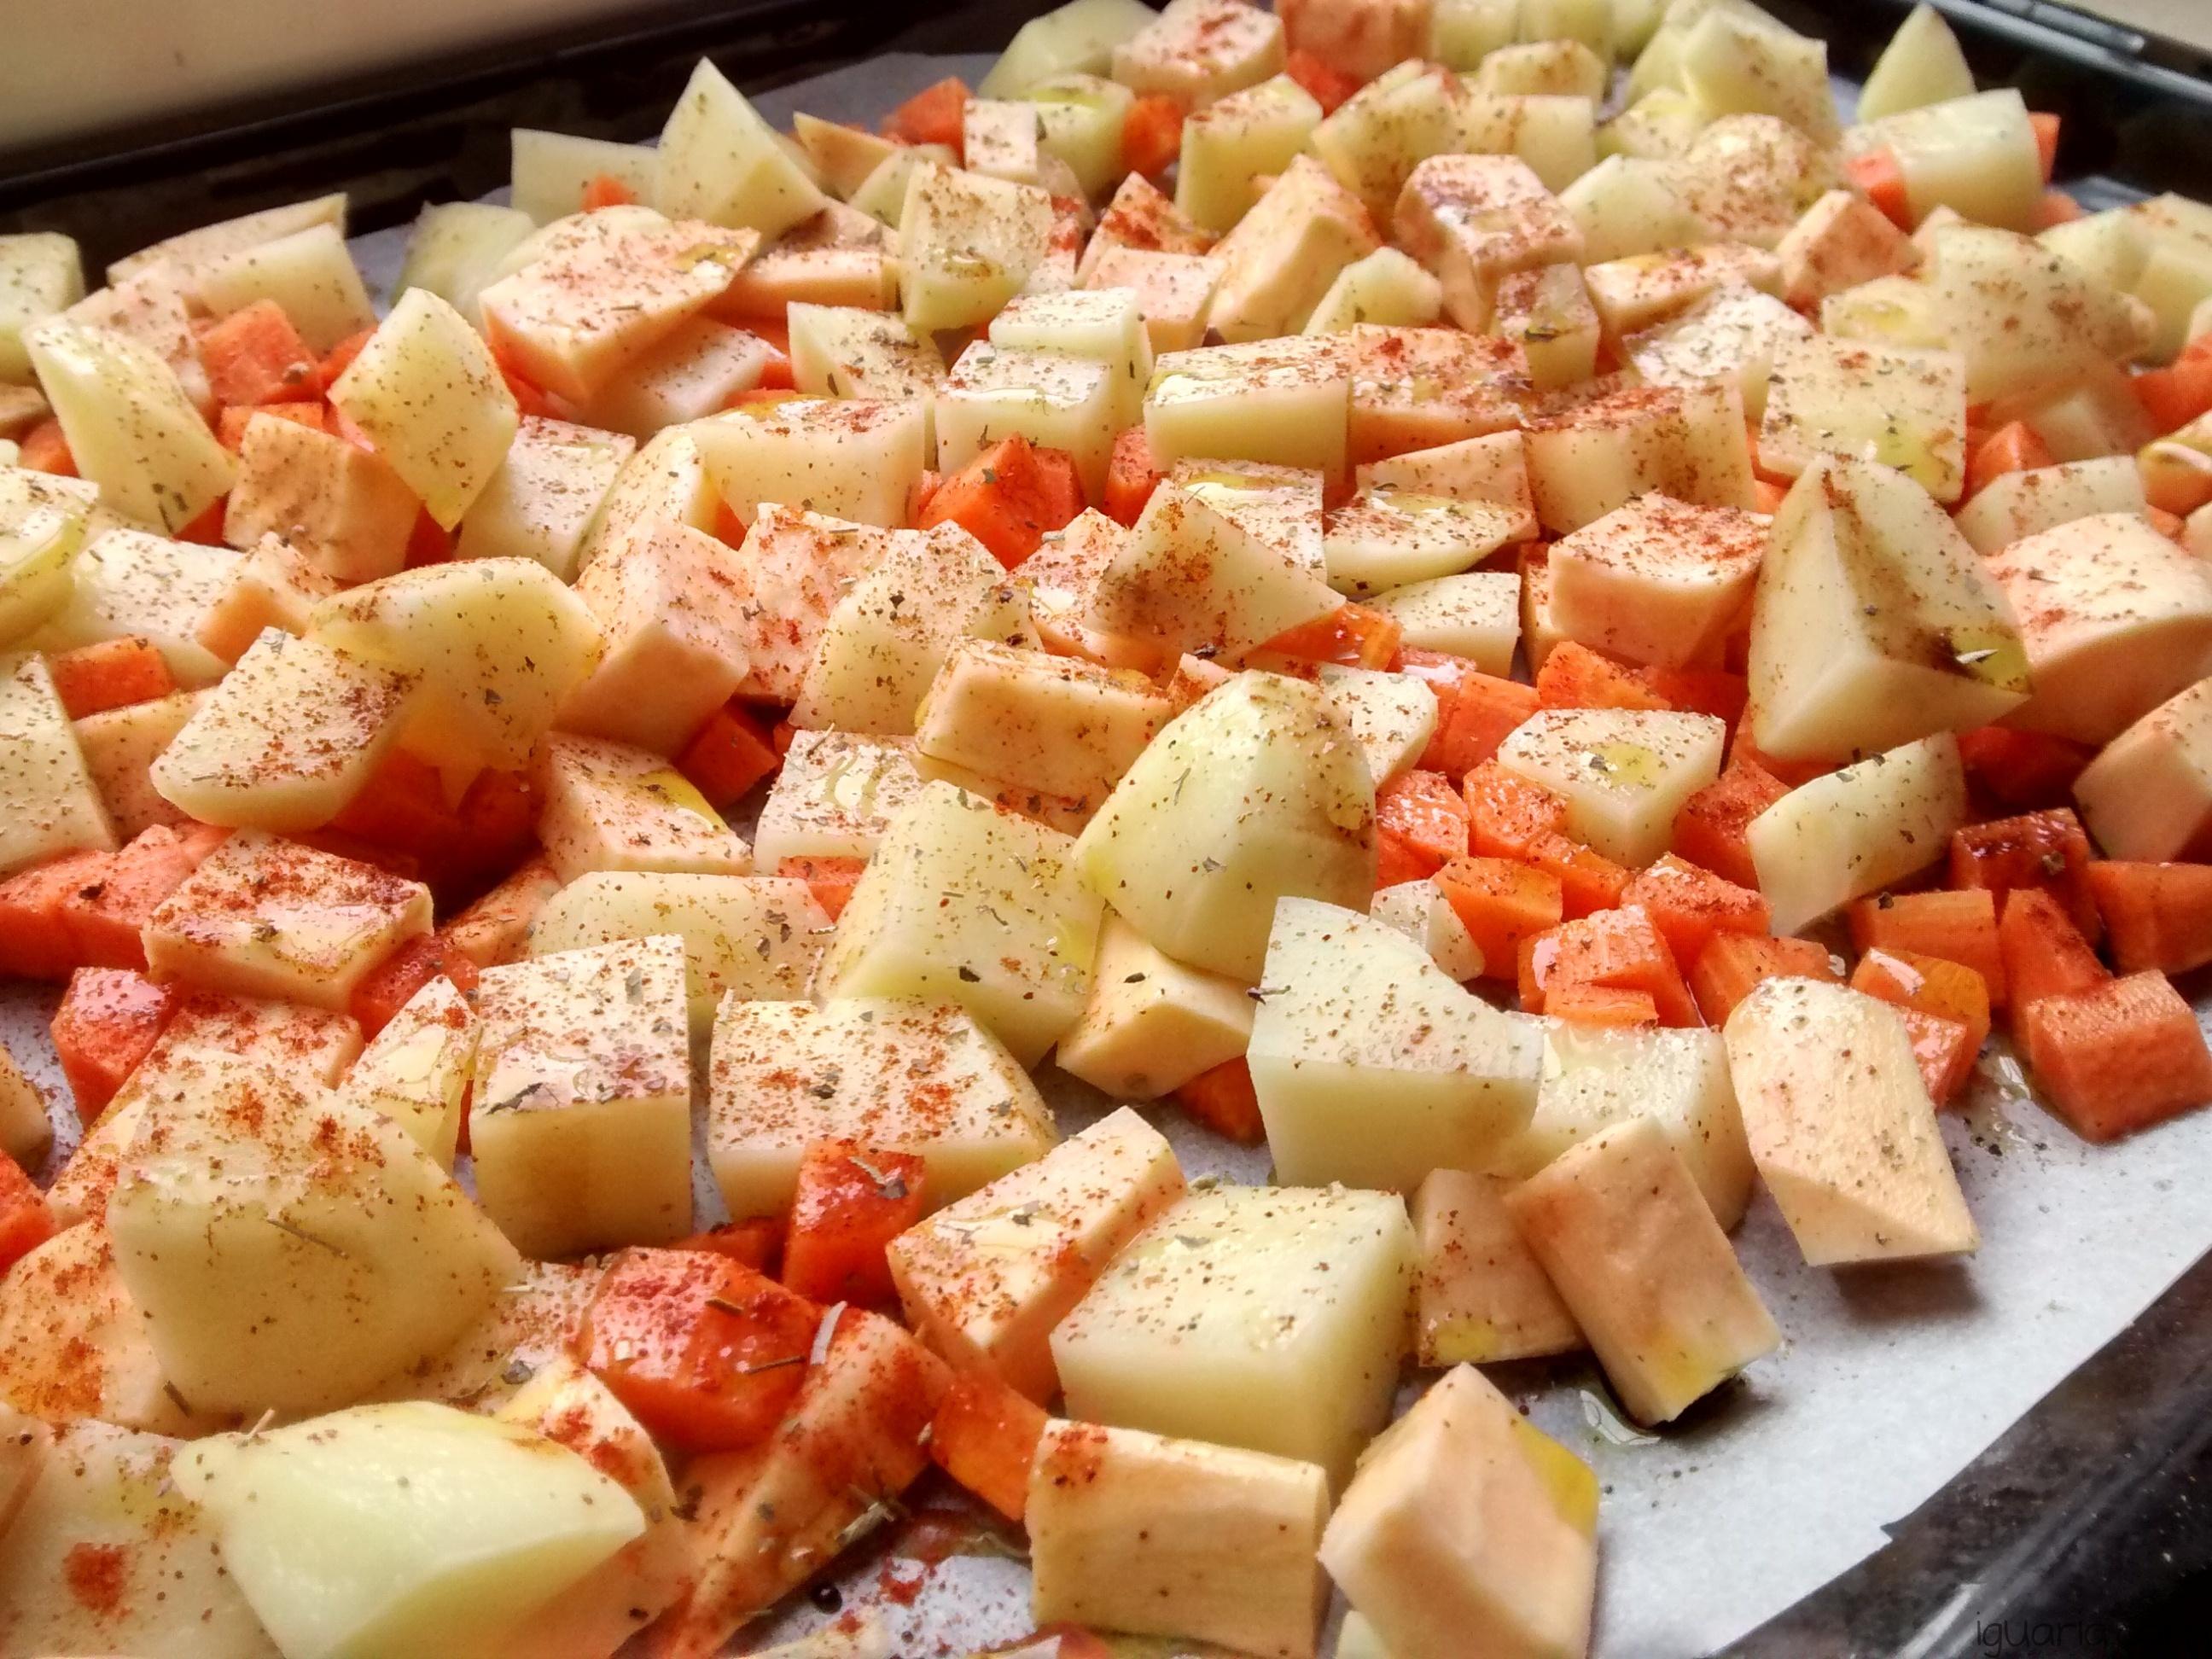 iguaria-temperar-batata-e-cenoura-forno